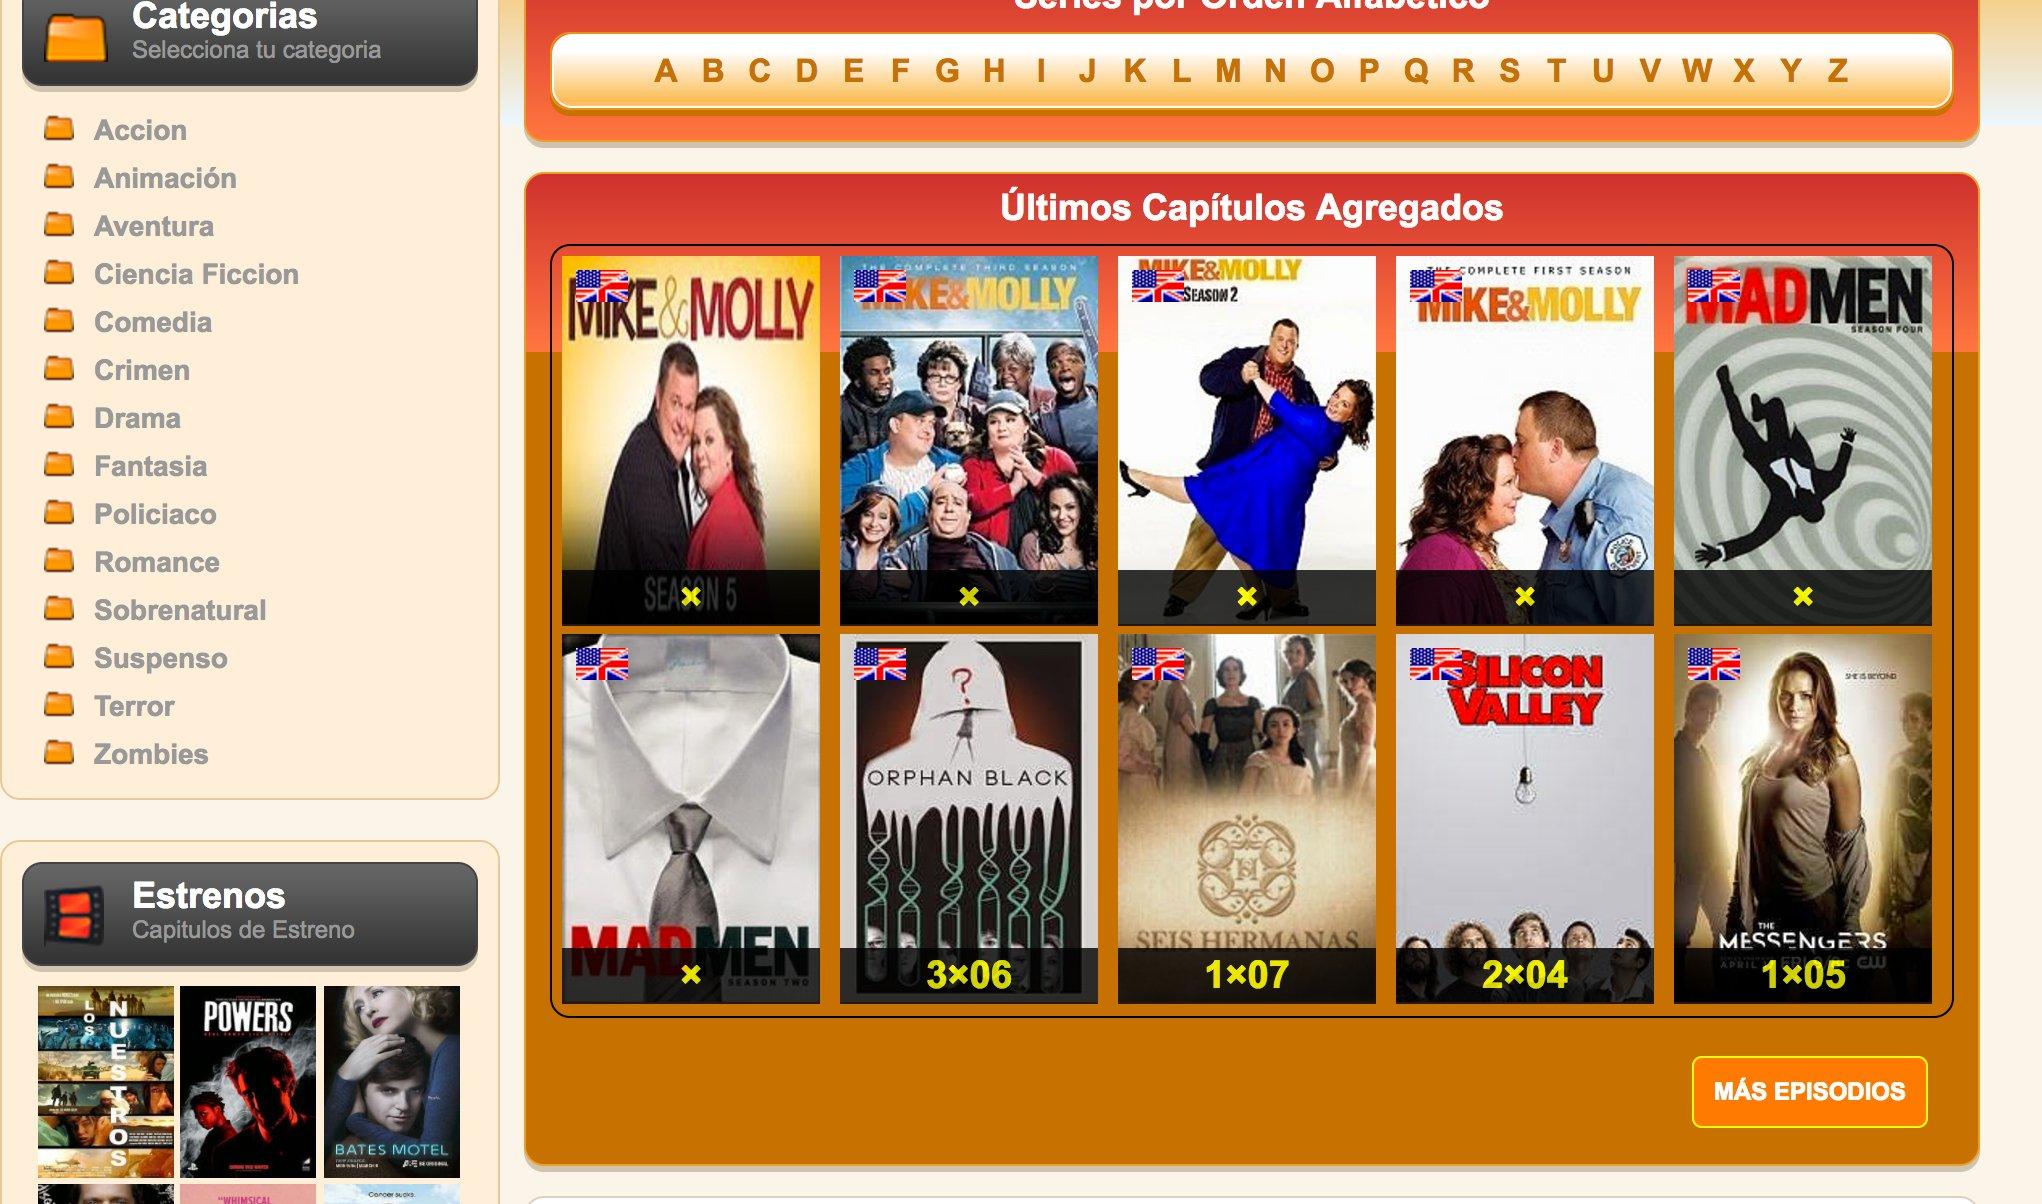 VerSeriesyNovelas - Web para ver series online | articulosdeopinion.net